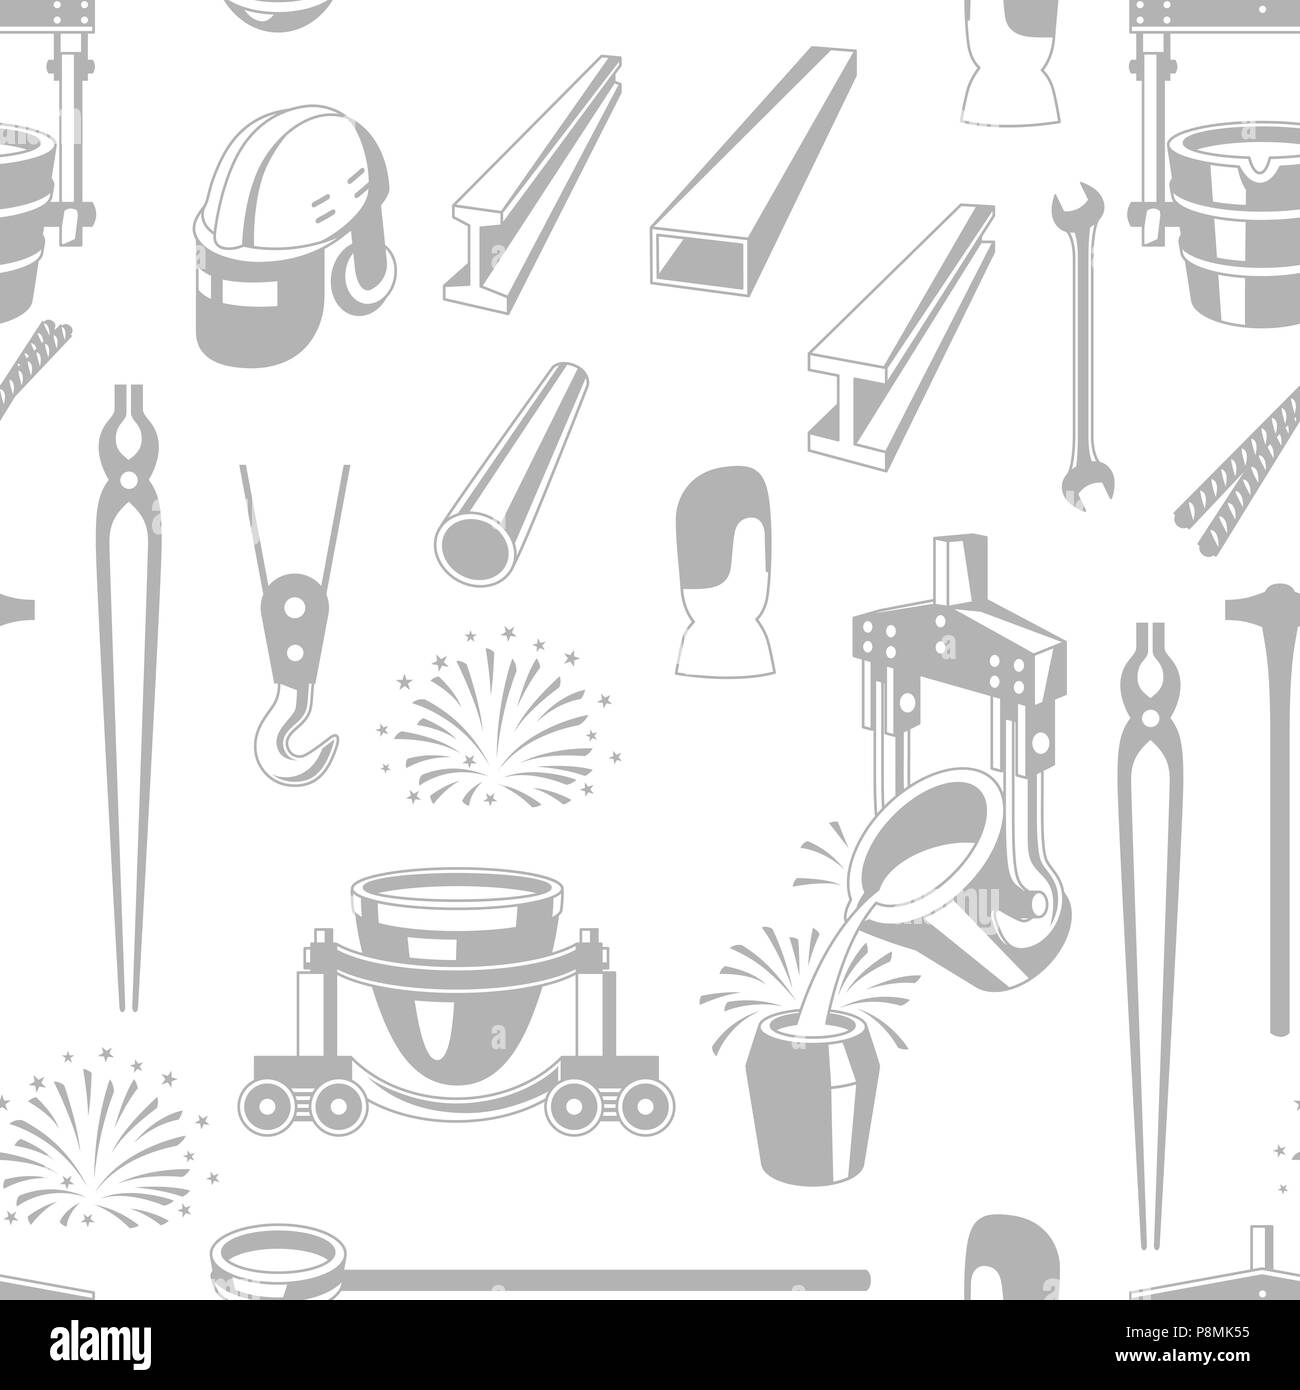 Metallurgical seamless pattern. - Stock Image